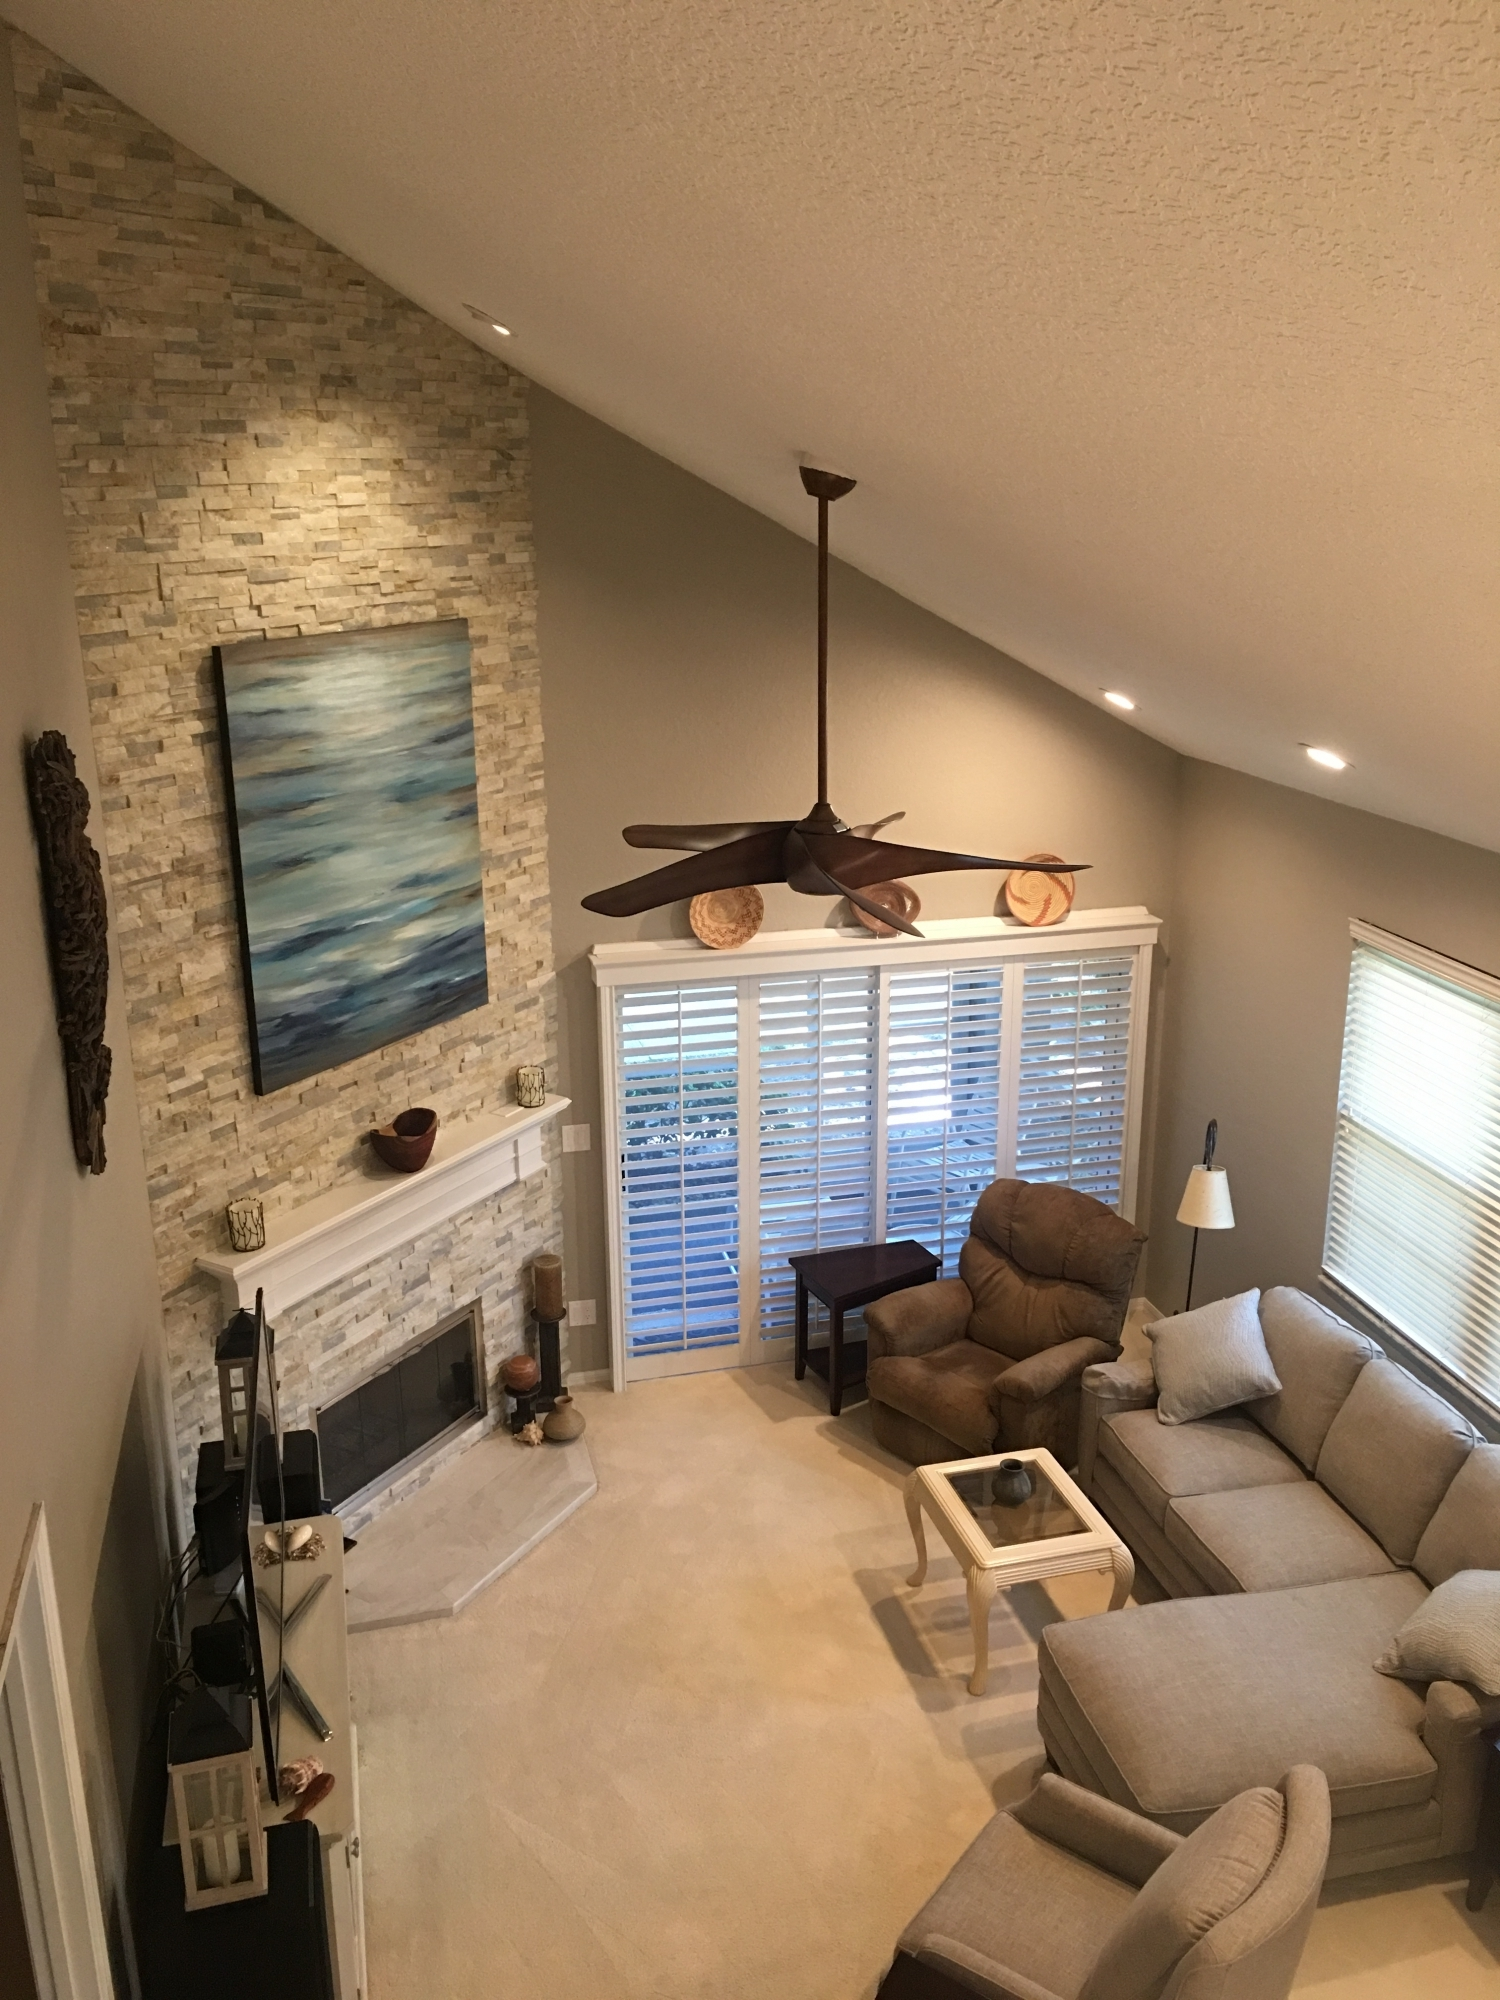 Home Remodeling in Longwood FL